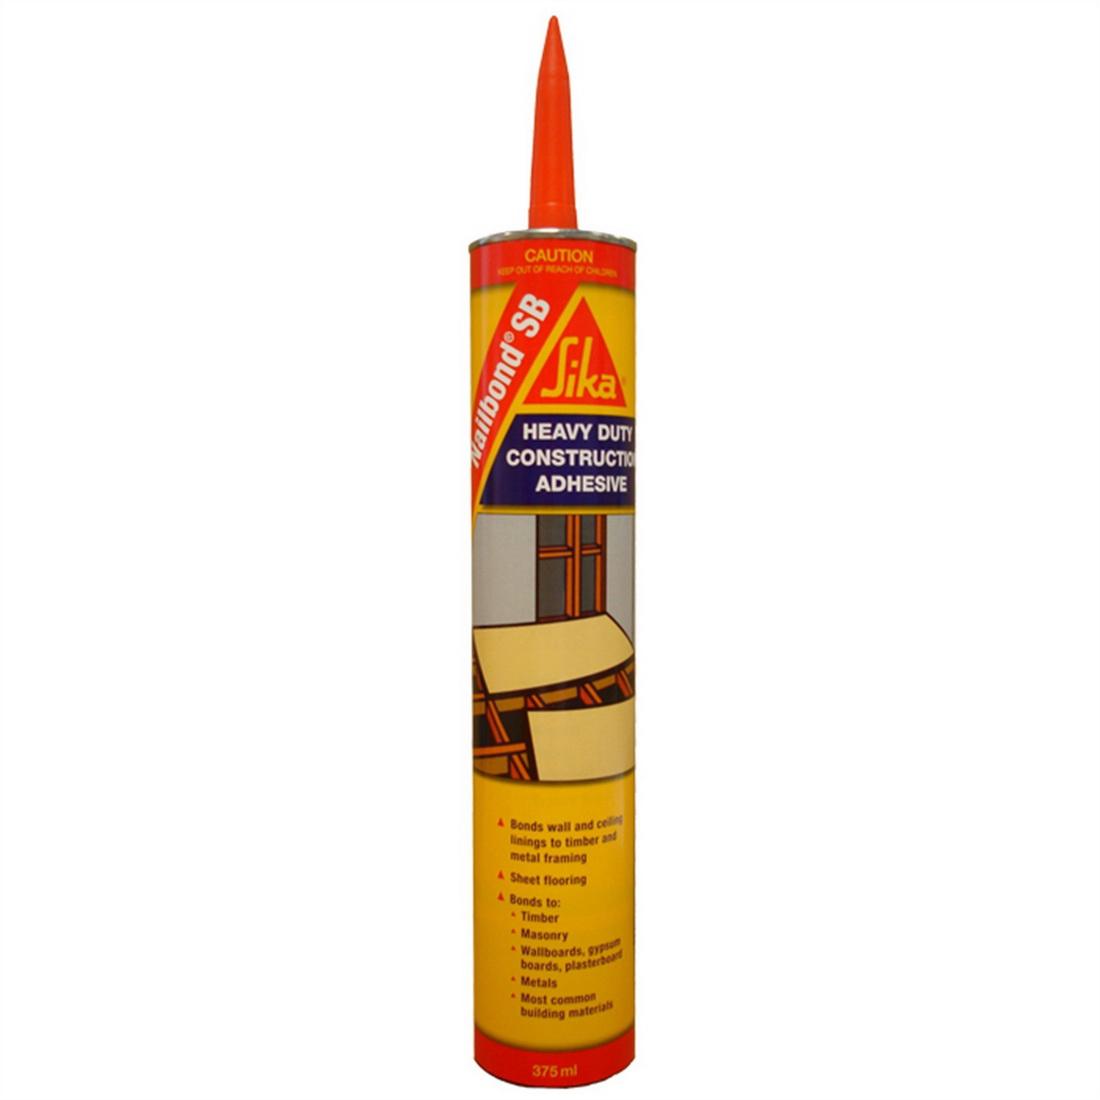 Nailbond Sb 375ml Original Stud & Wallboard Adhesive Beige